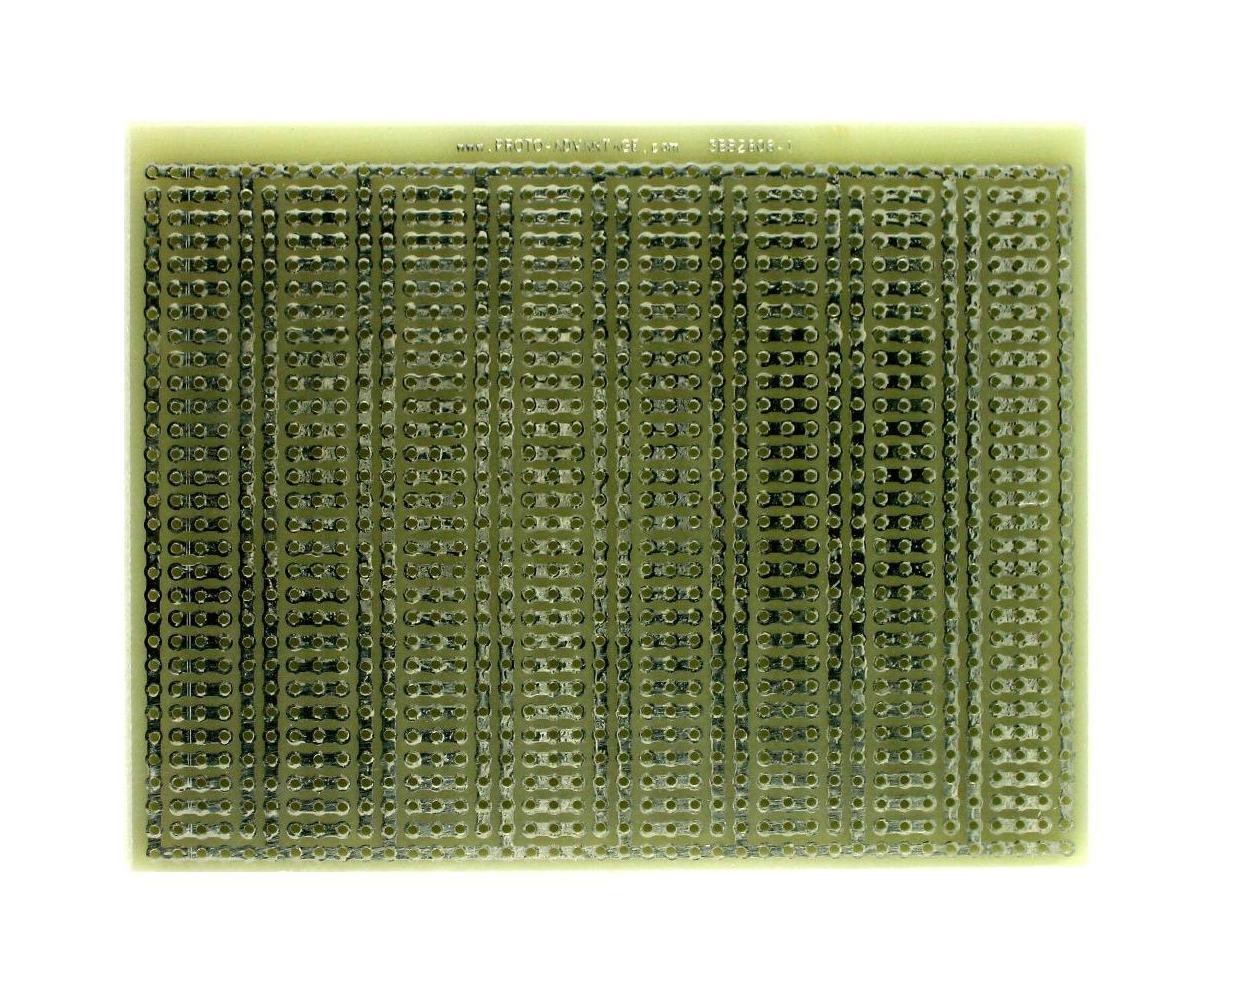 Solder Breadboard (28 row 8 column) 0